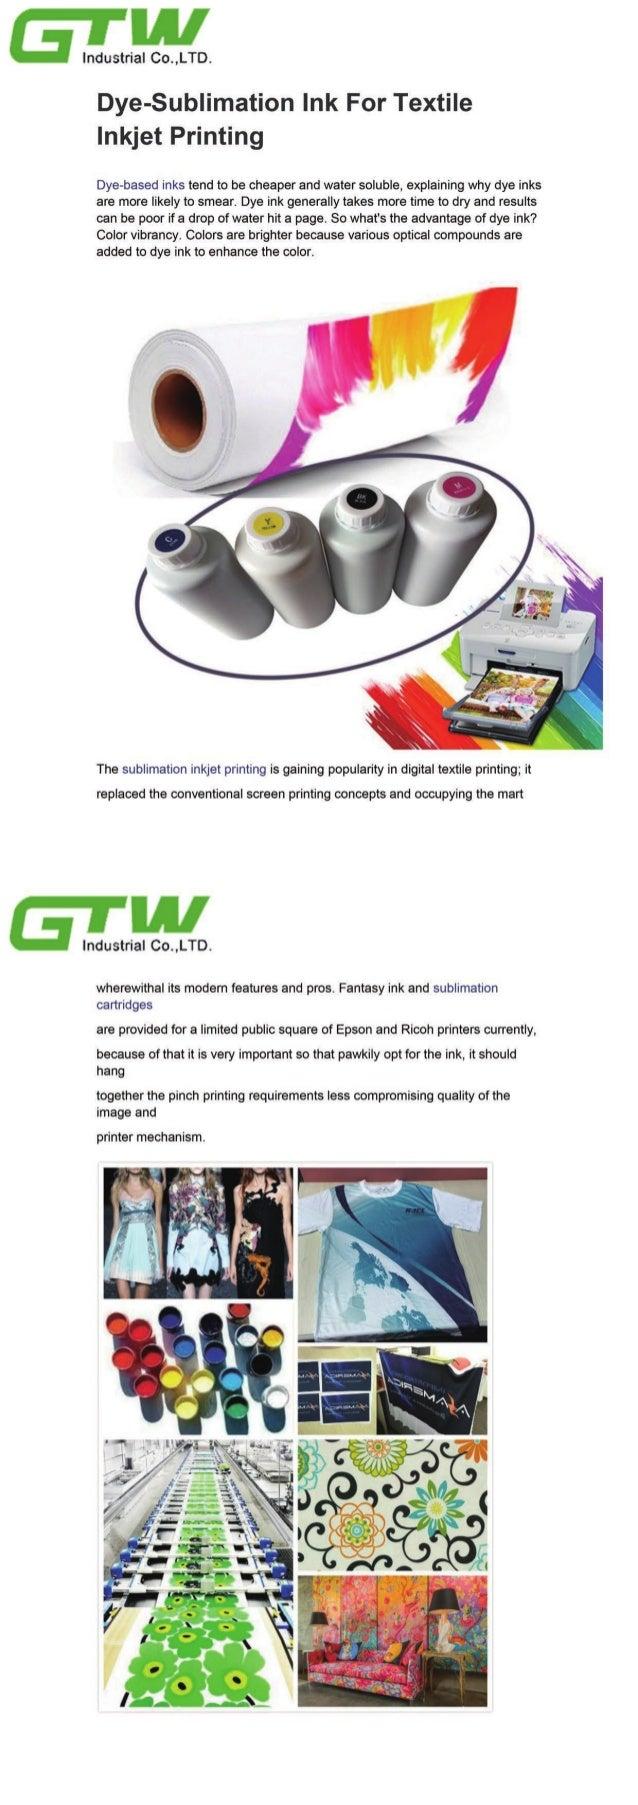 Dye sublimation ink for textile inkjet printing